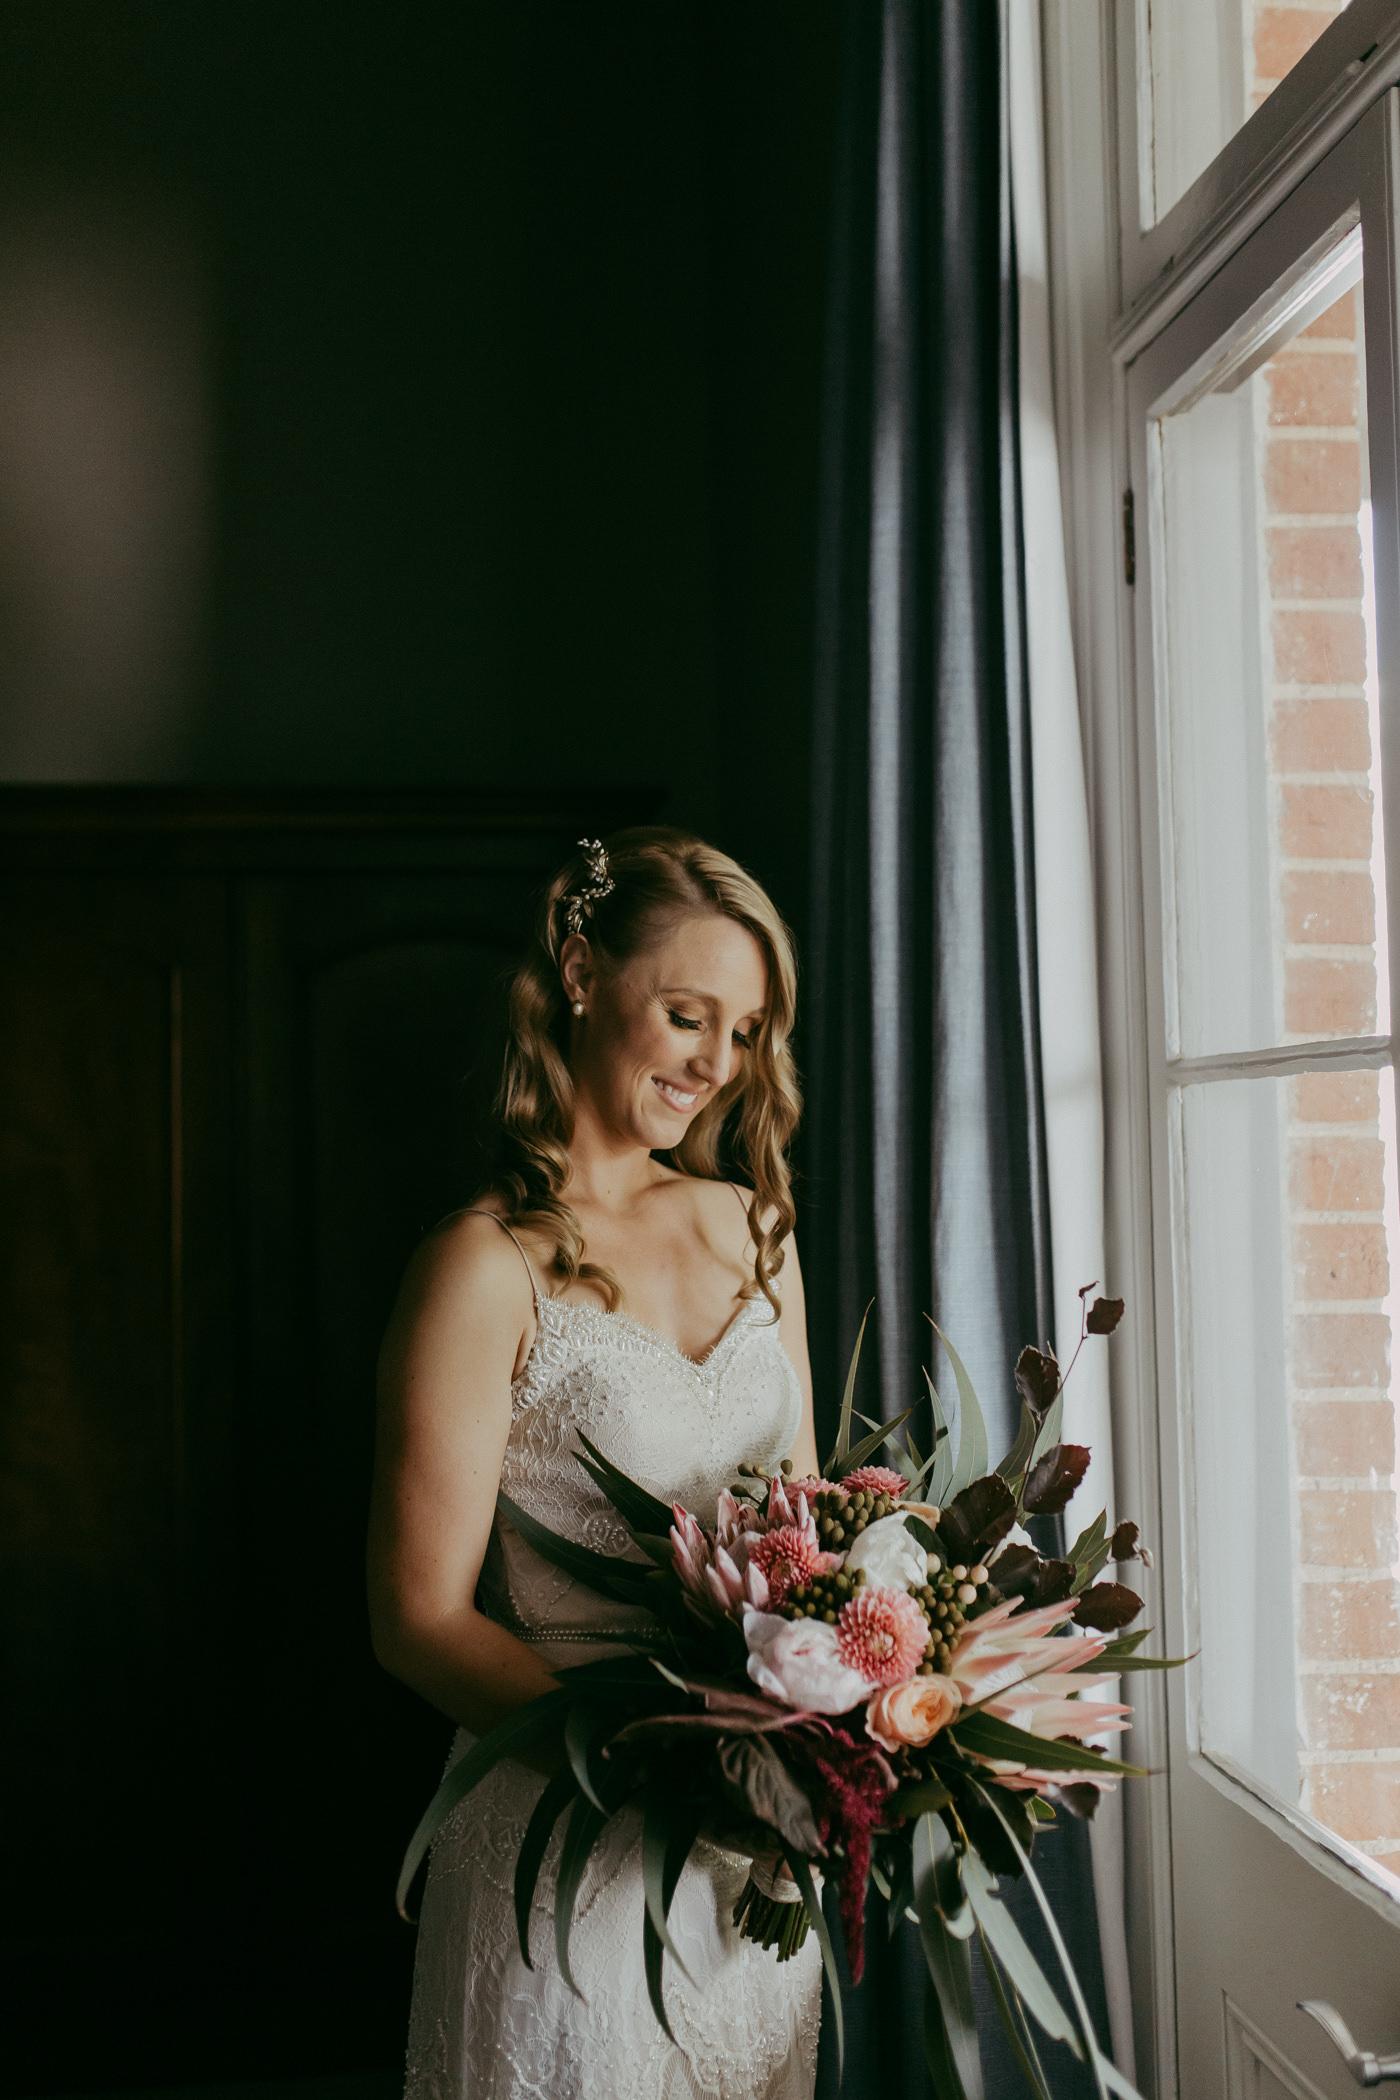 Anthony & Eliet - Wagga Wagga Wedding - Country NSW - Samantha Heather Photography-50.jpg